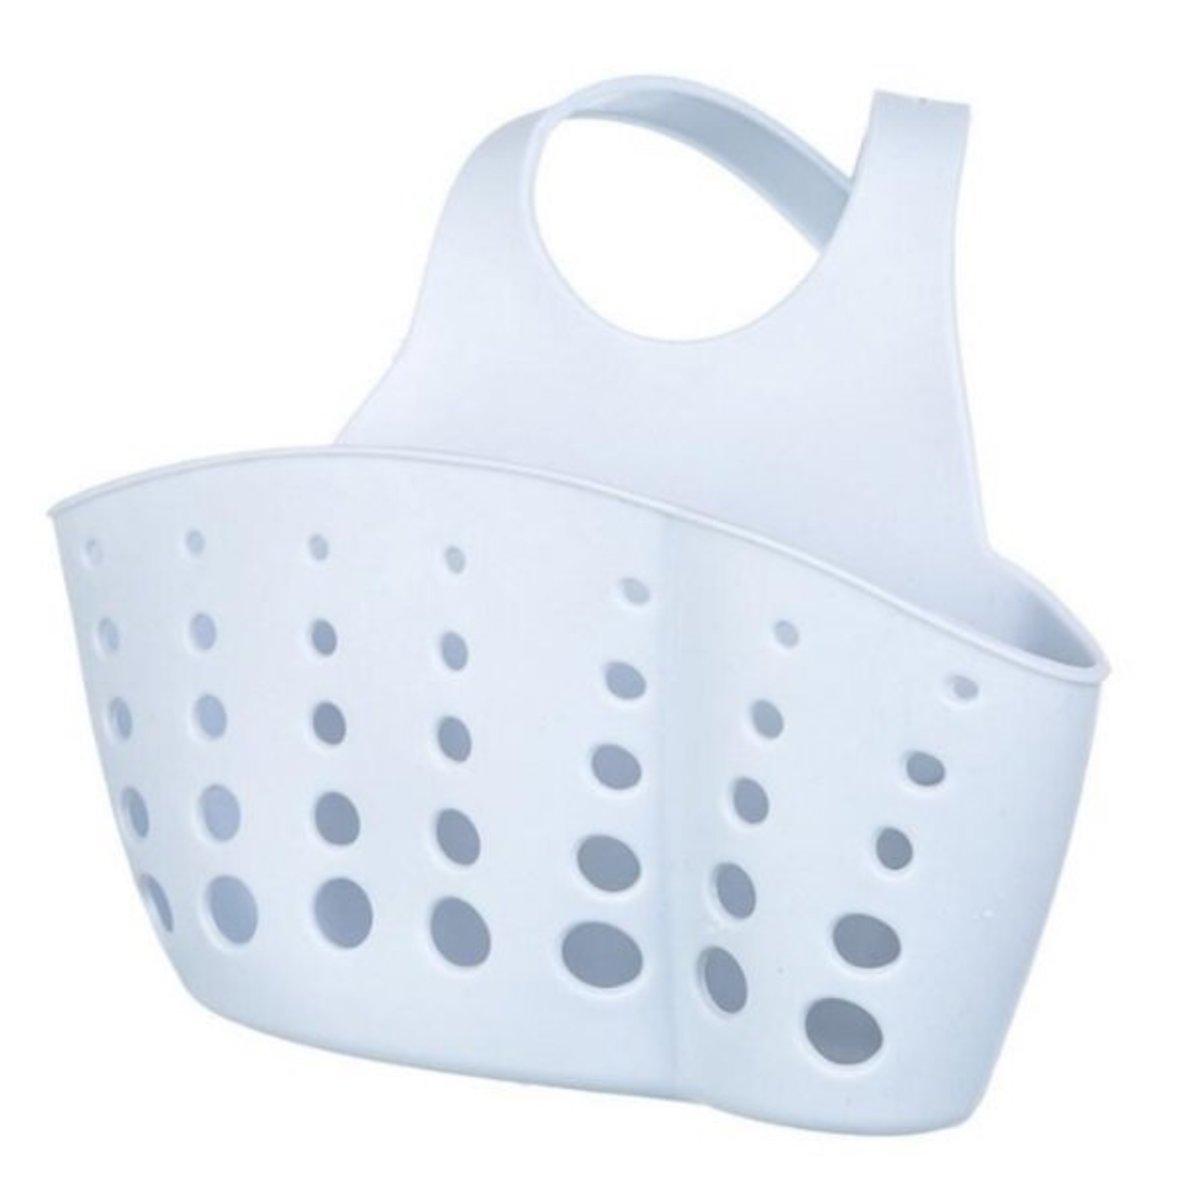 Adjustable snap-in sink storage basket (purple) (length 10x width 4x height 8cm)